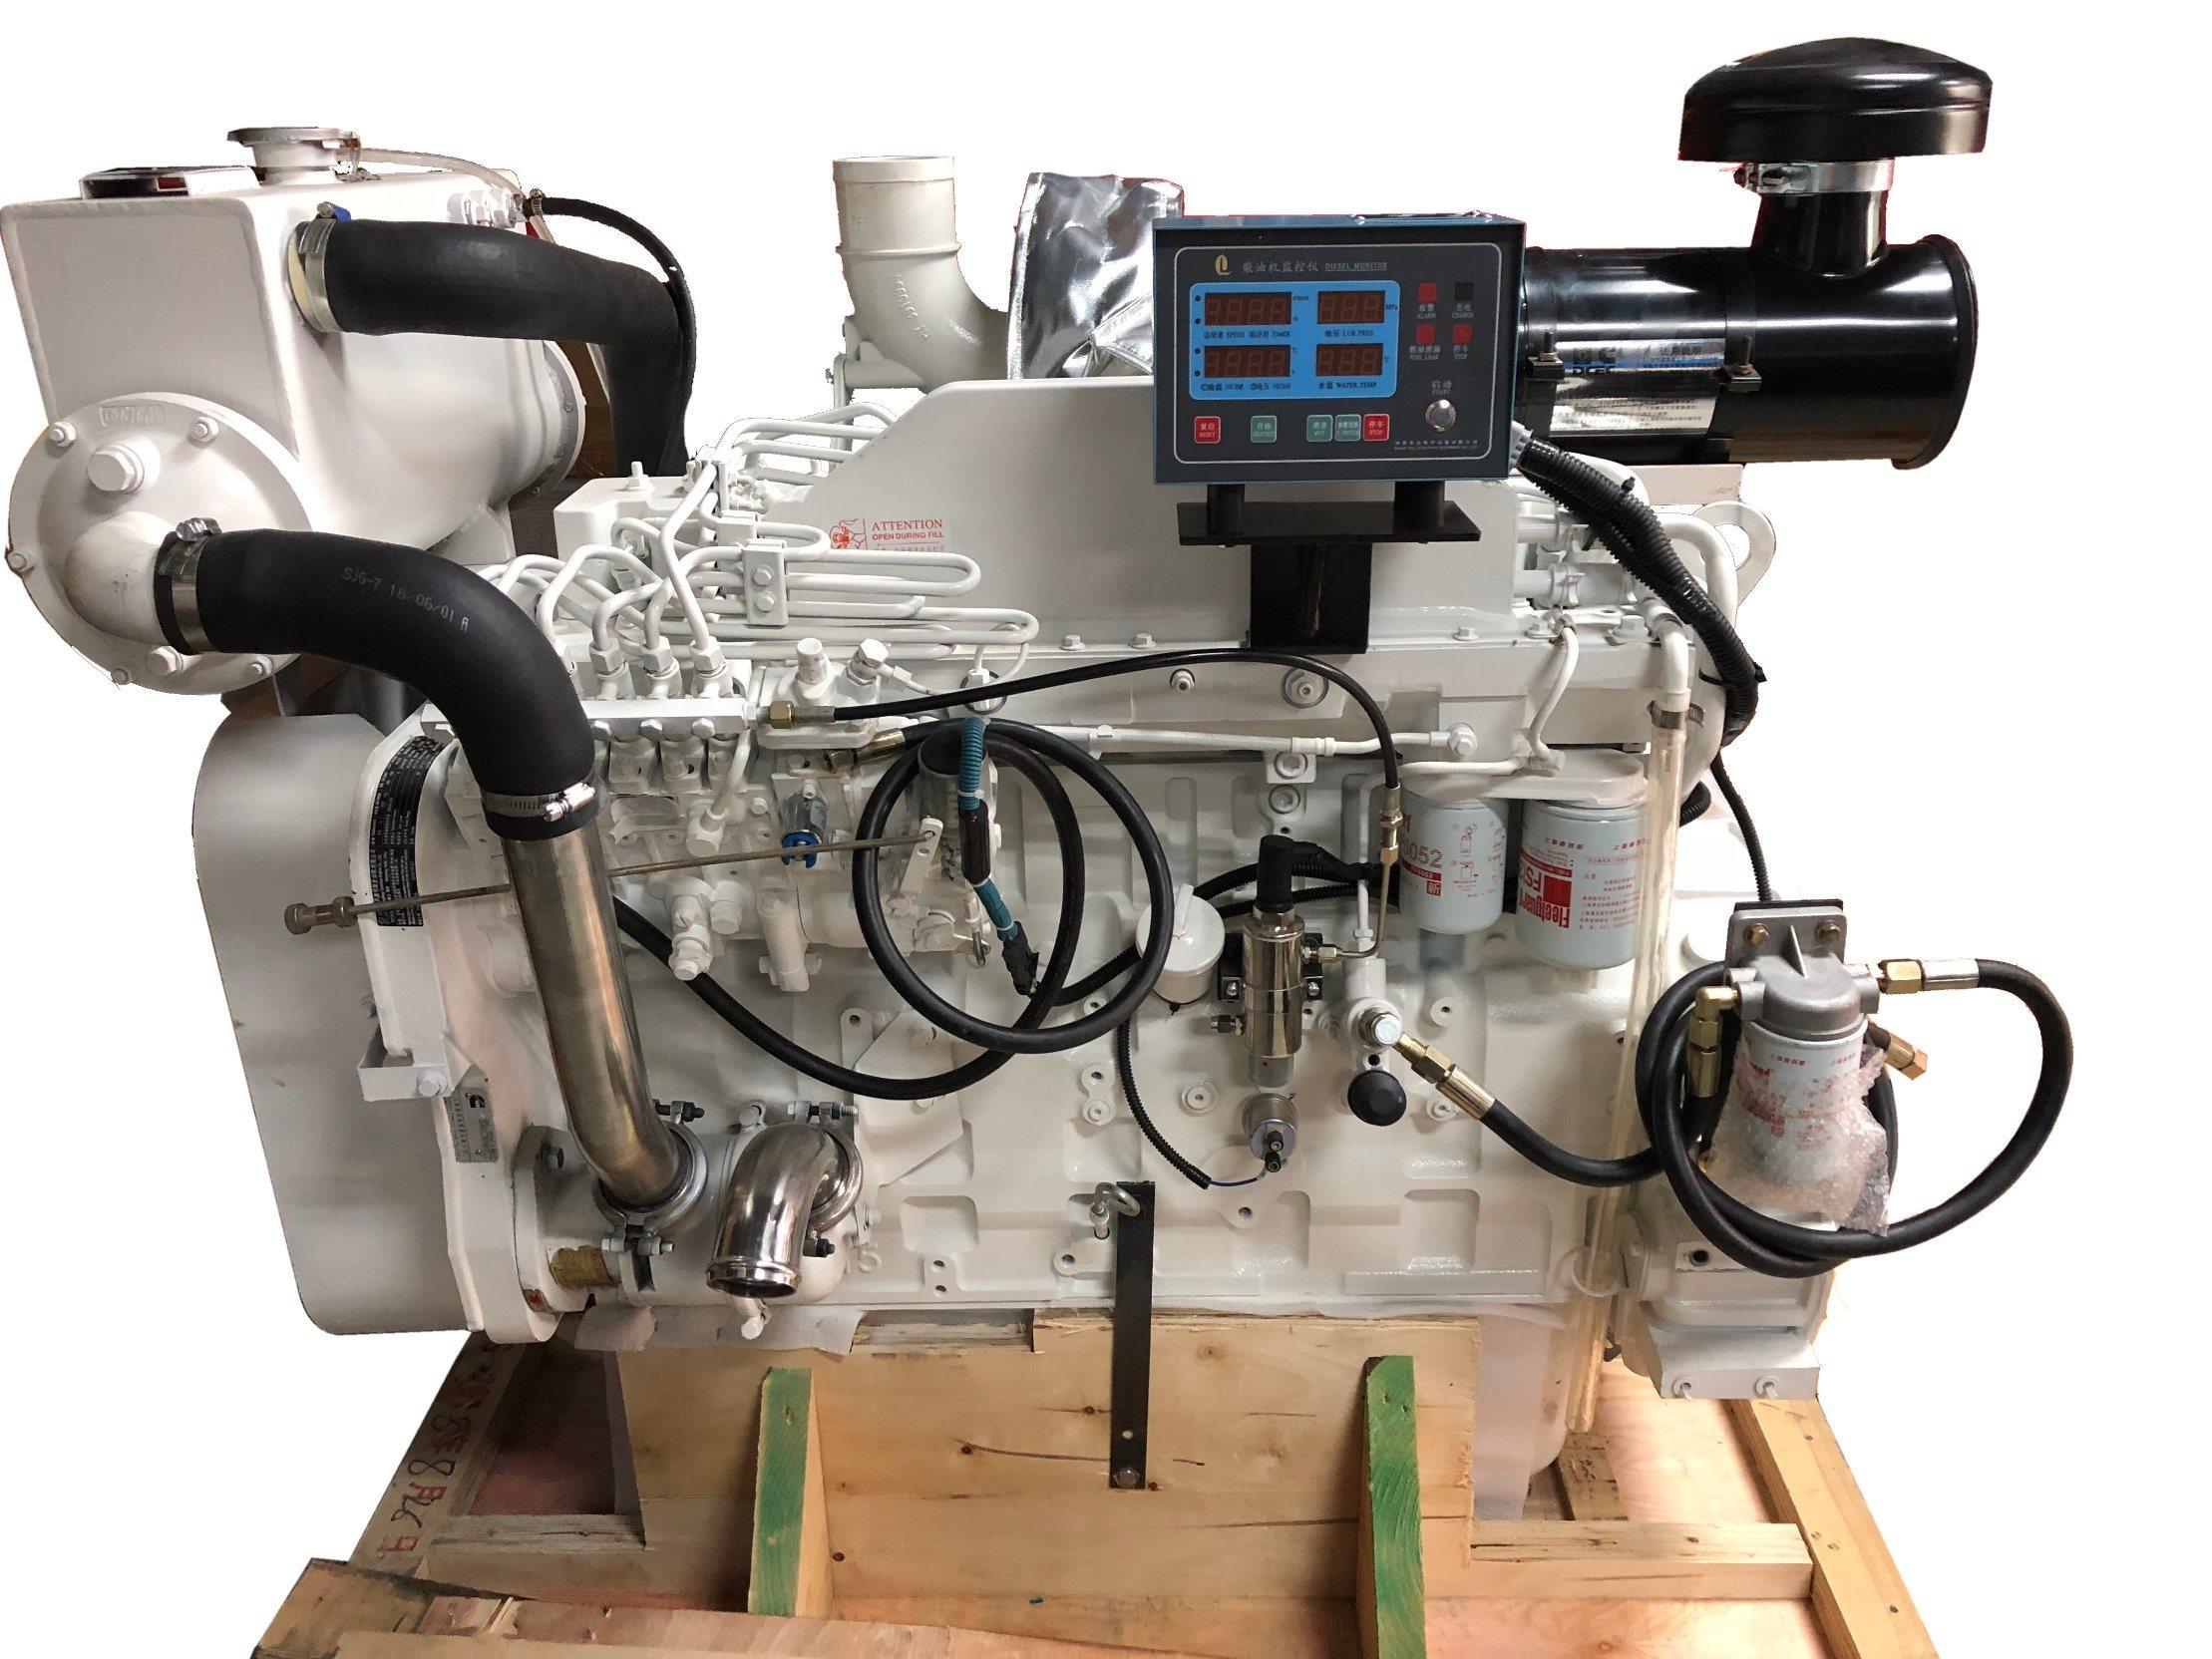 [Hot Item] Genuine Cummins Diesel Engine Used for Marine